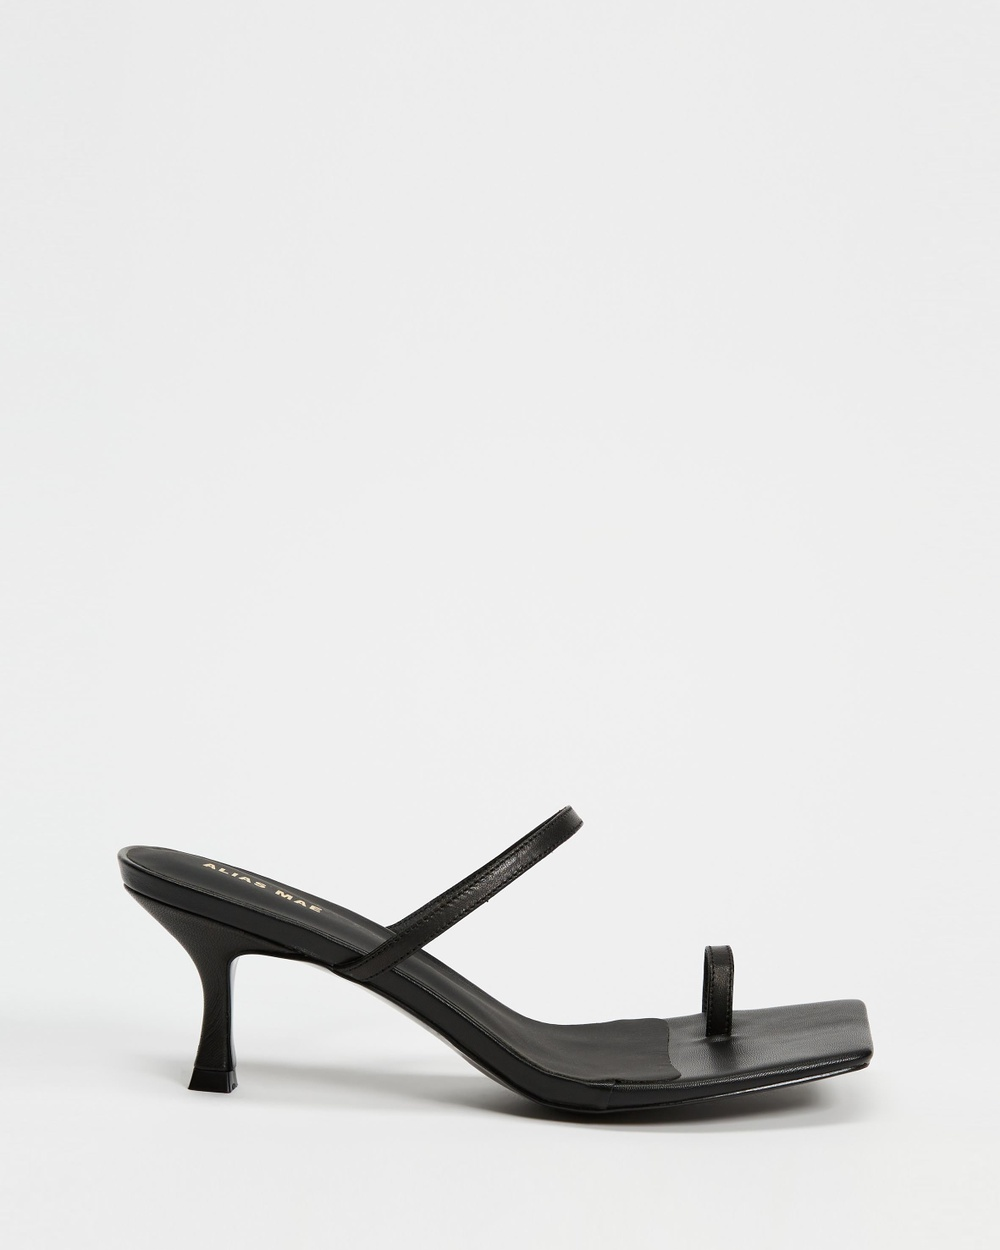 Alias Mae Baker Mid-low heels Black Leather